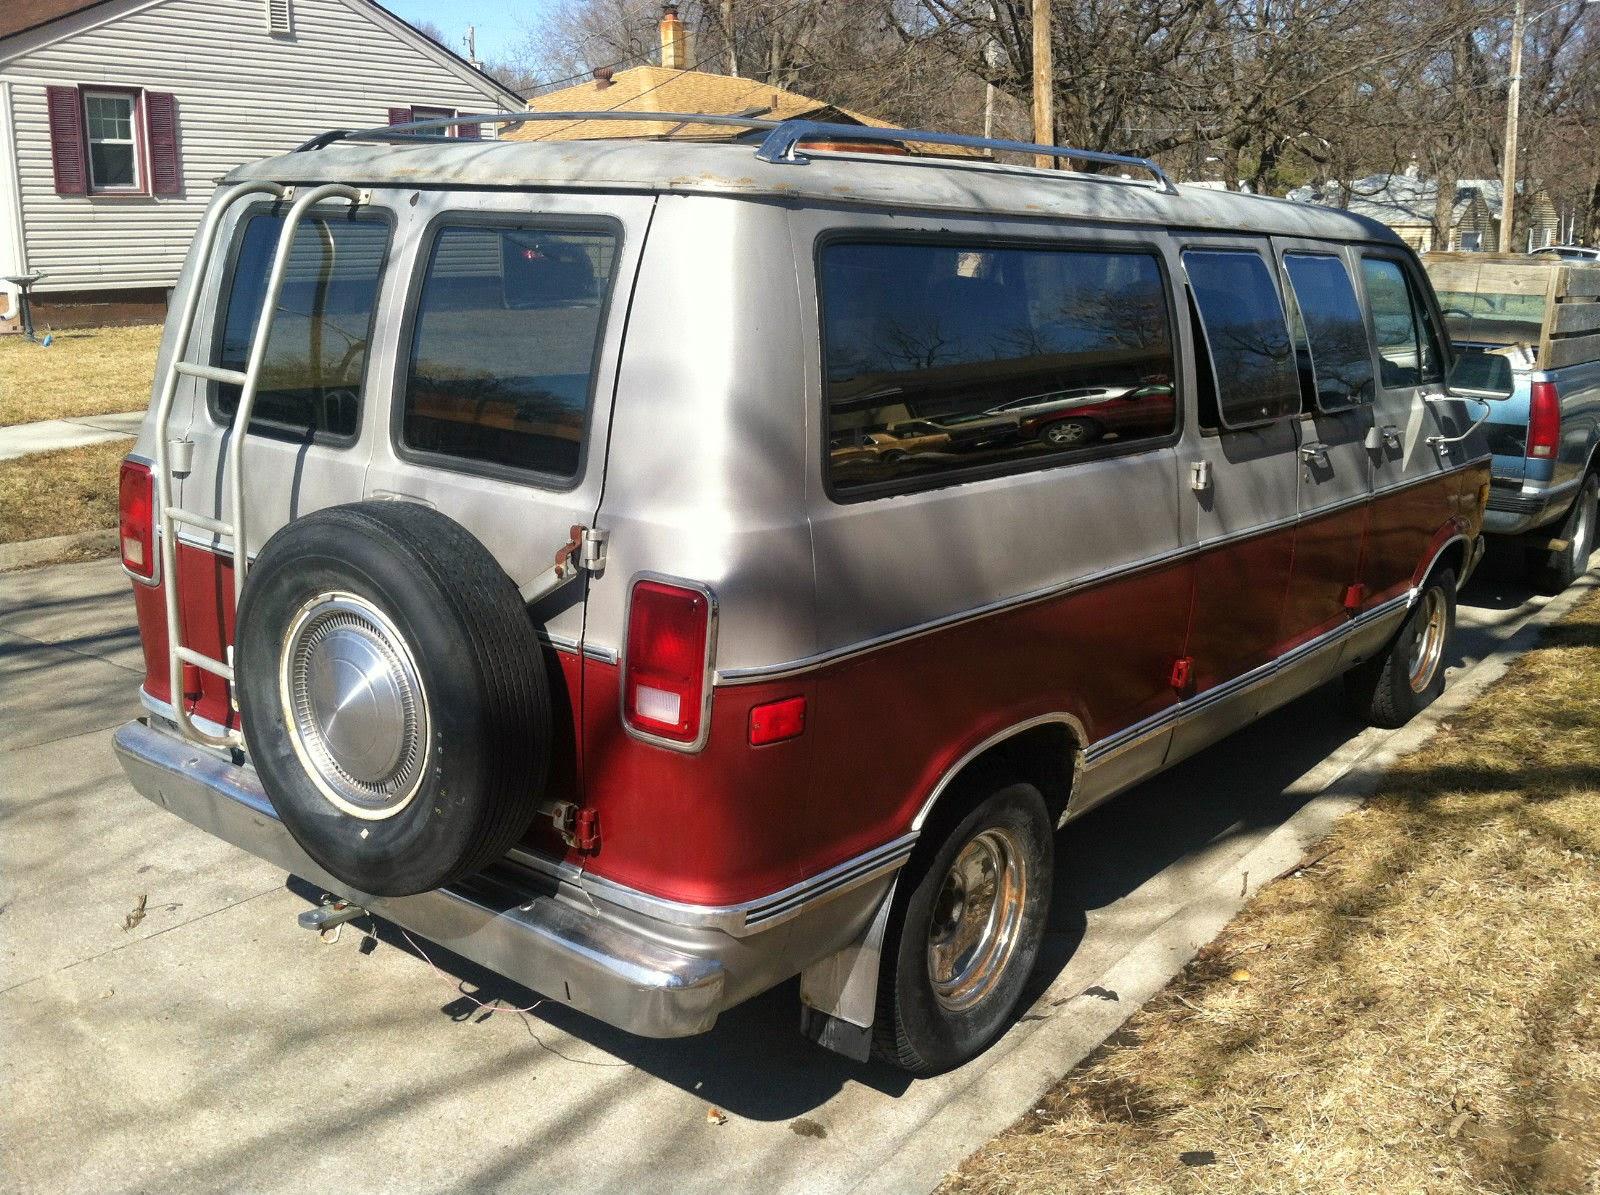 All American Classic Cars: 1978 Dodge Van B200 Tradesman